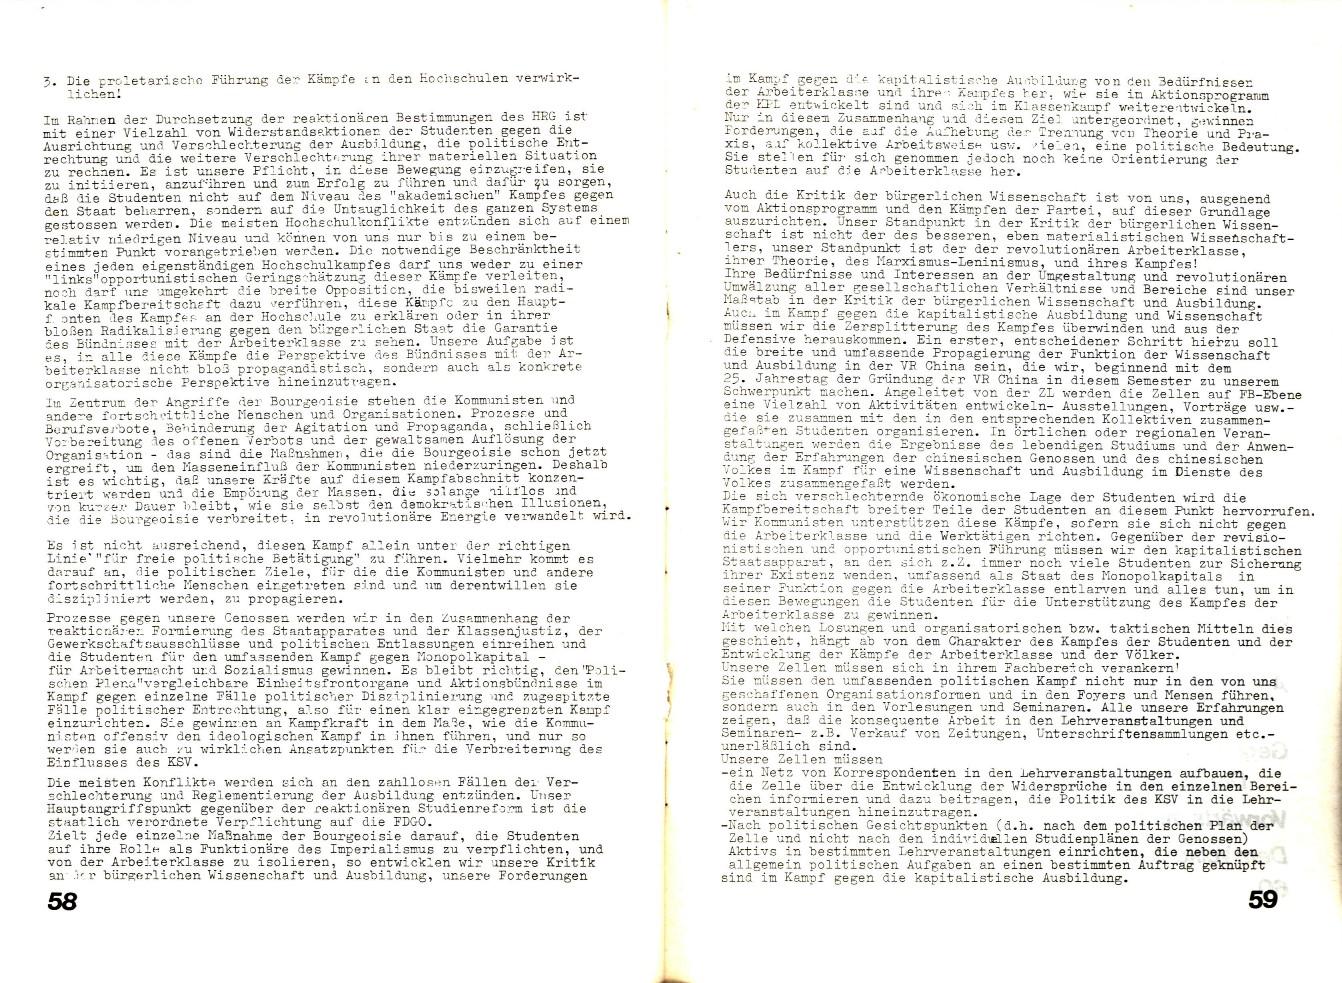 KSV_1974_Rechenschaftsbericht_31